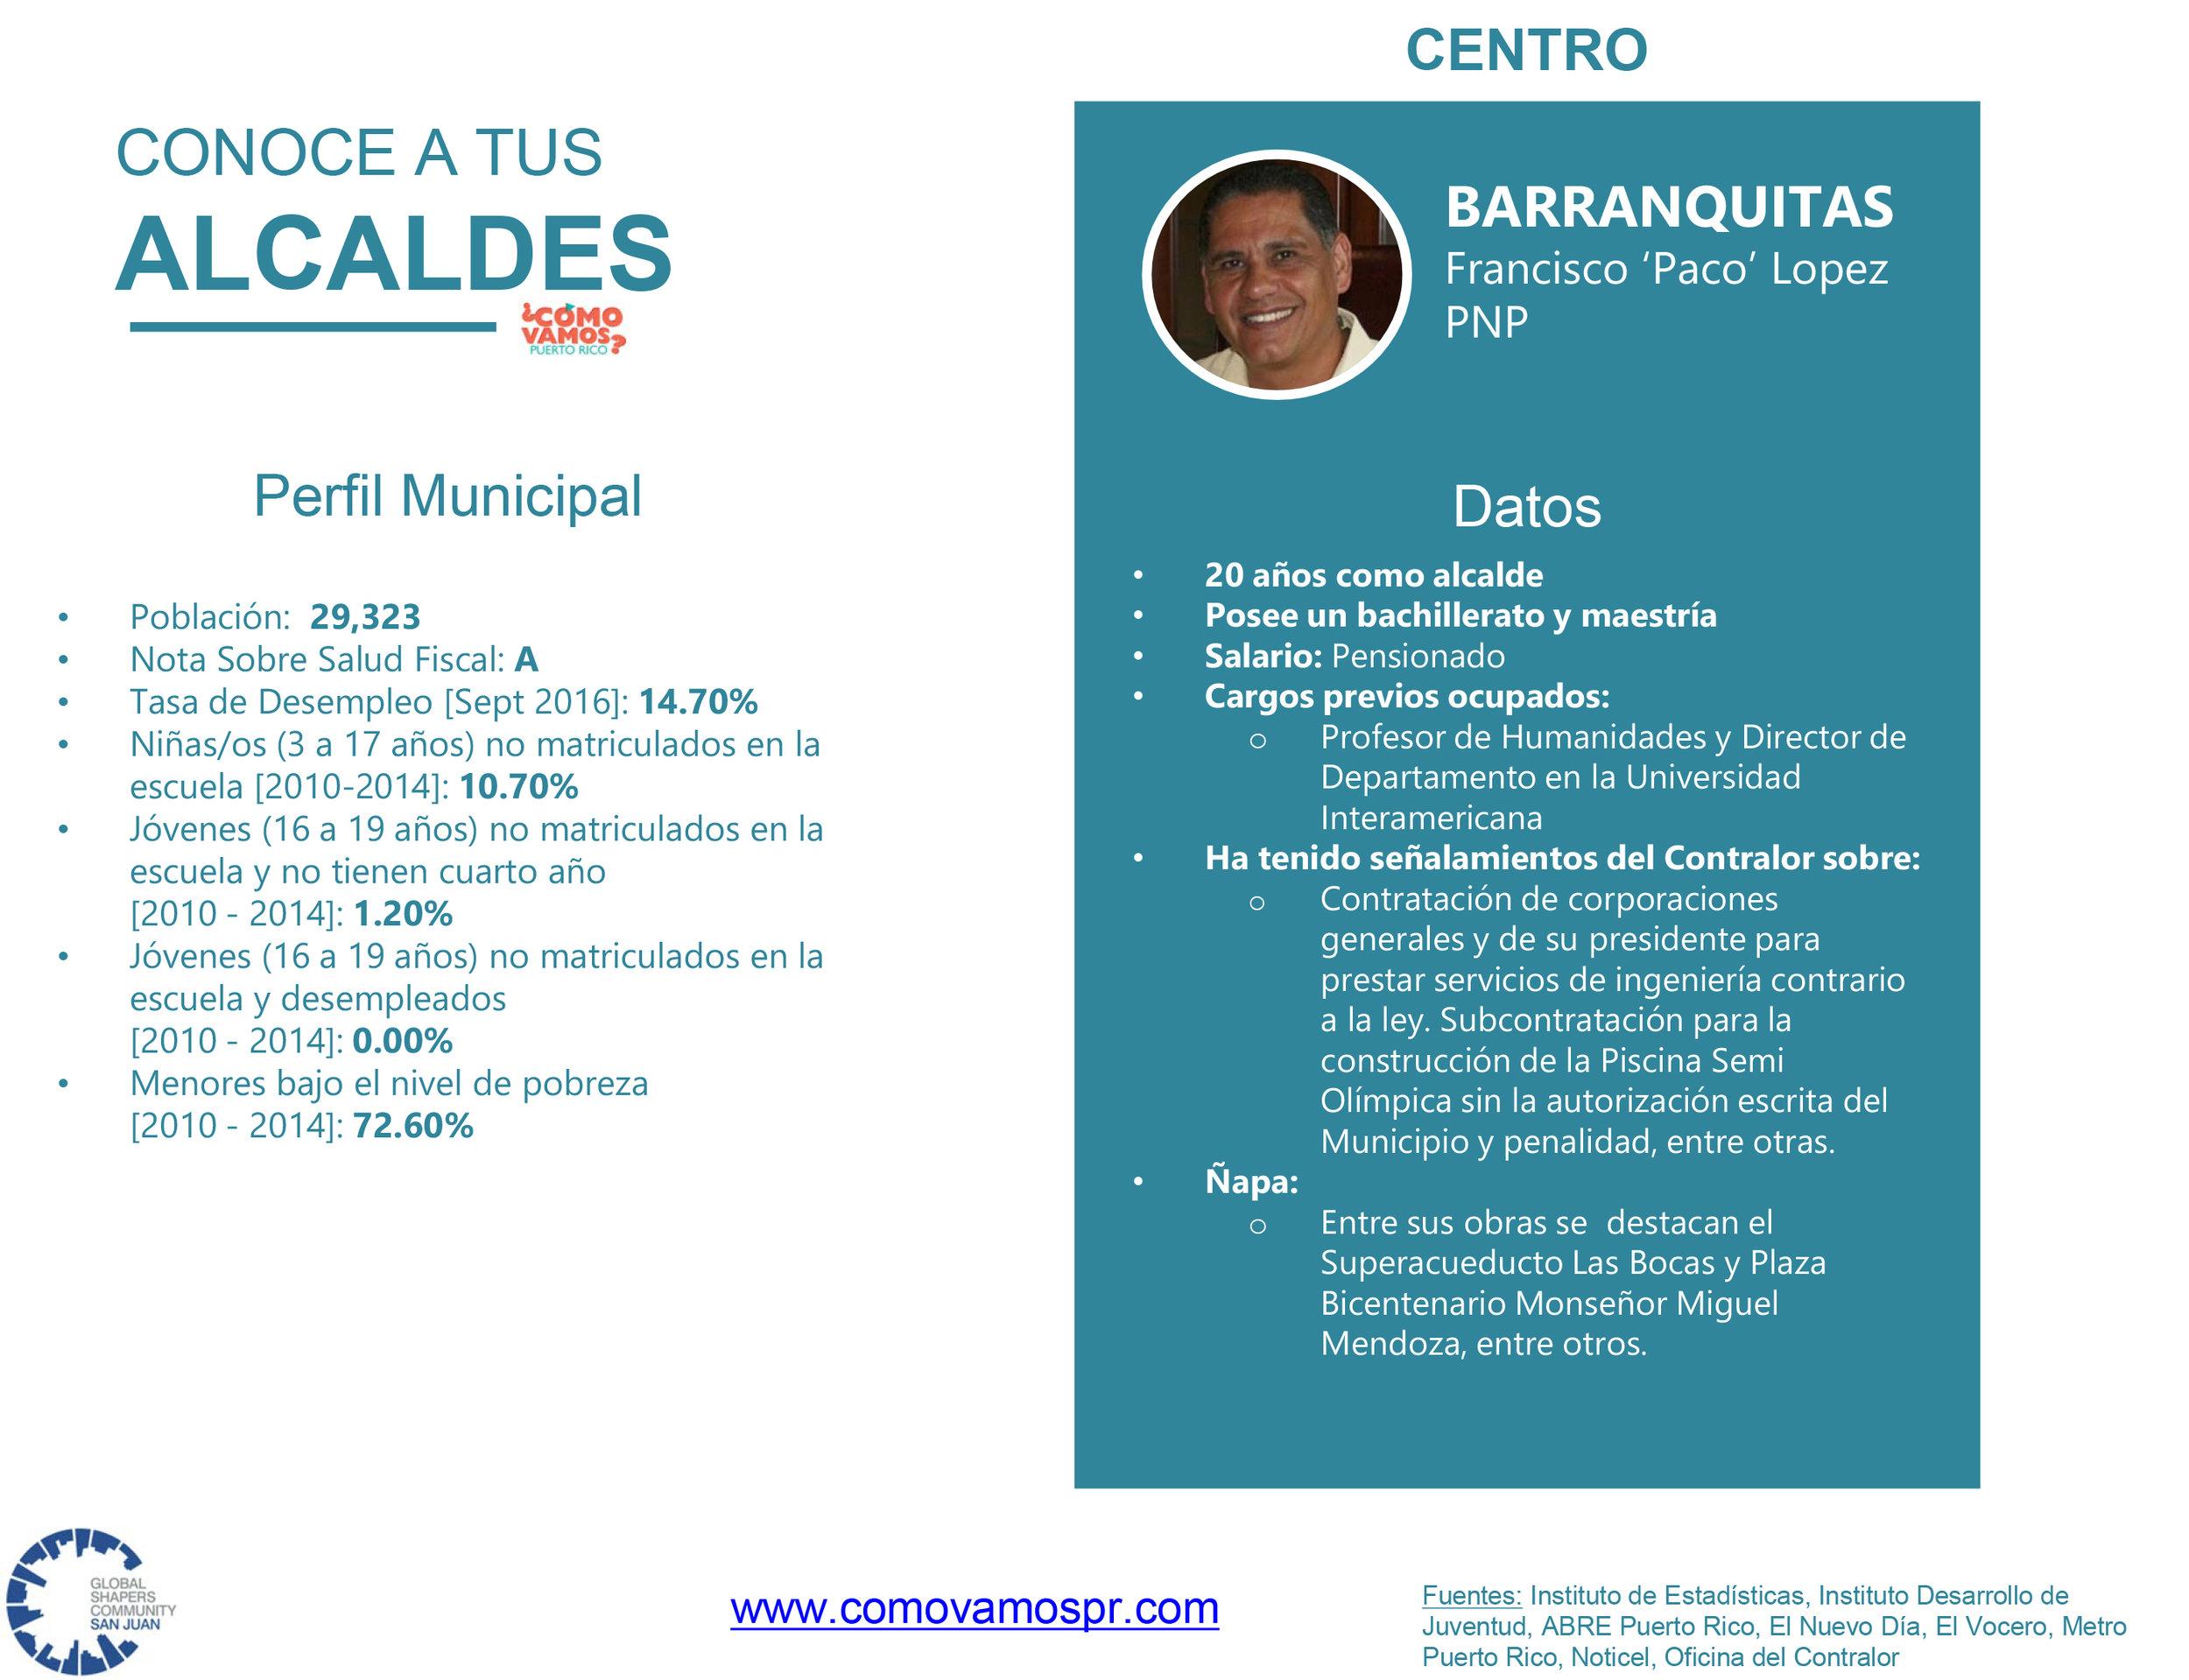 Alcaldes_Centro_Barranquitas.jpg